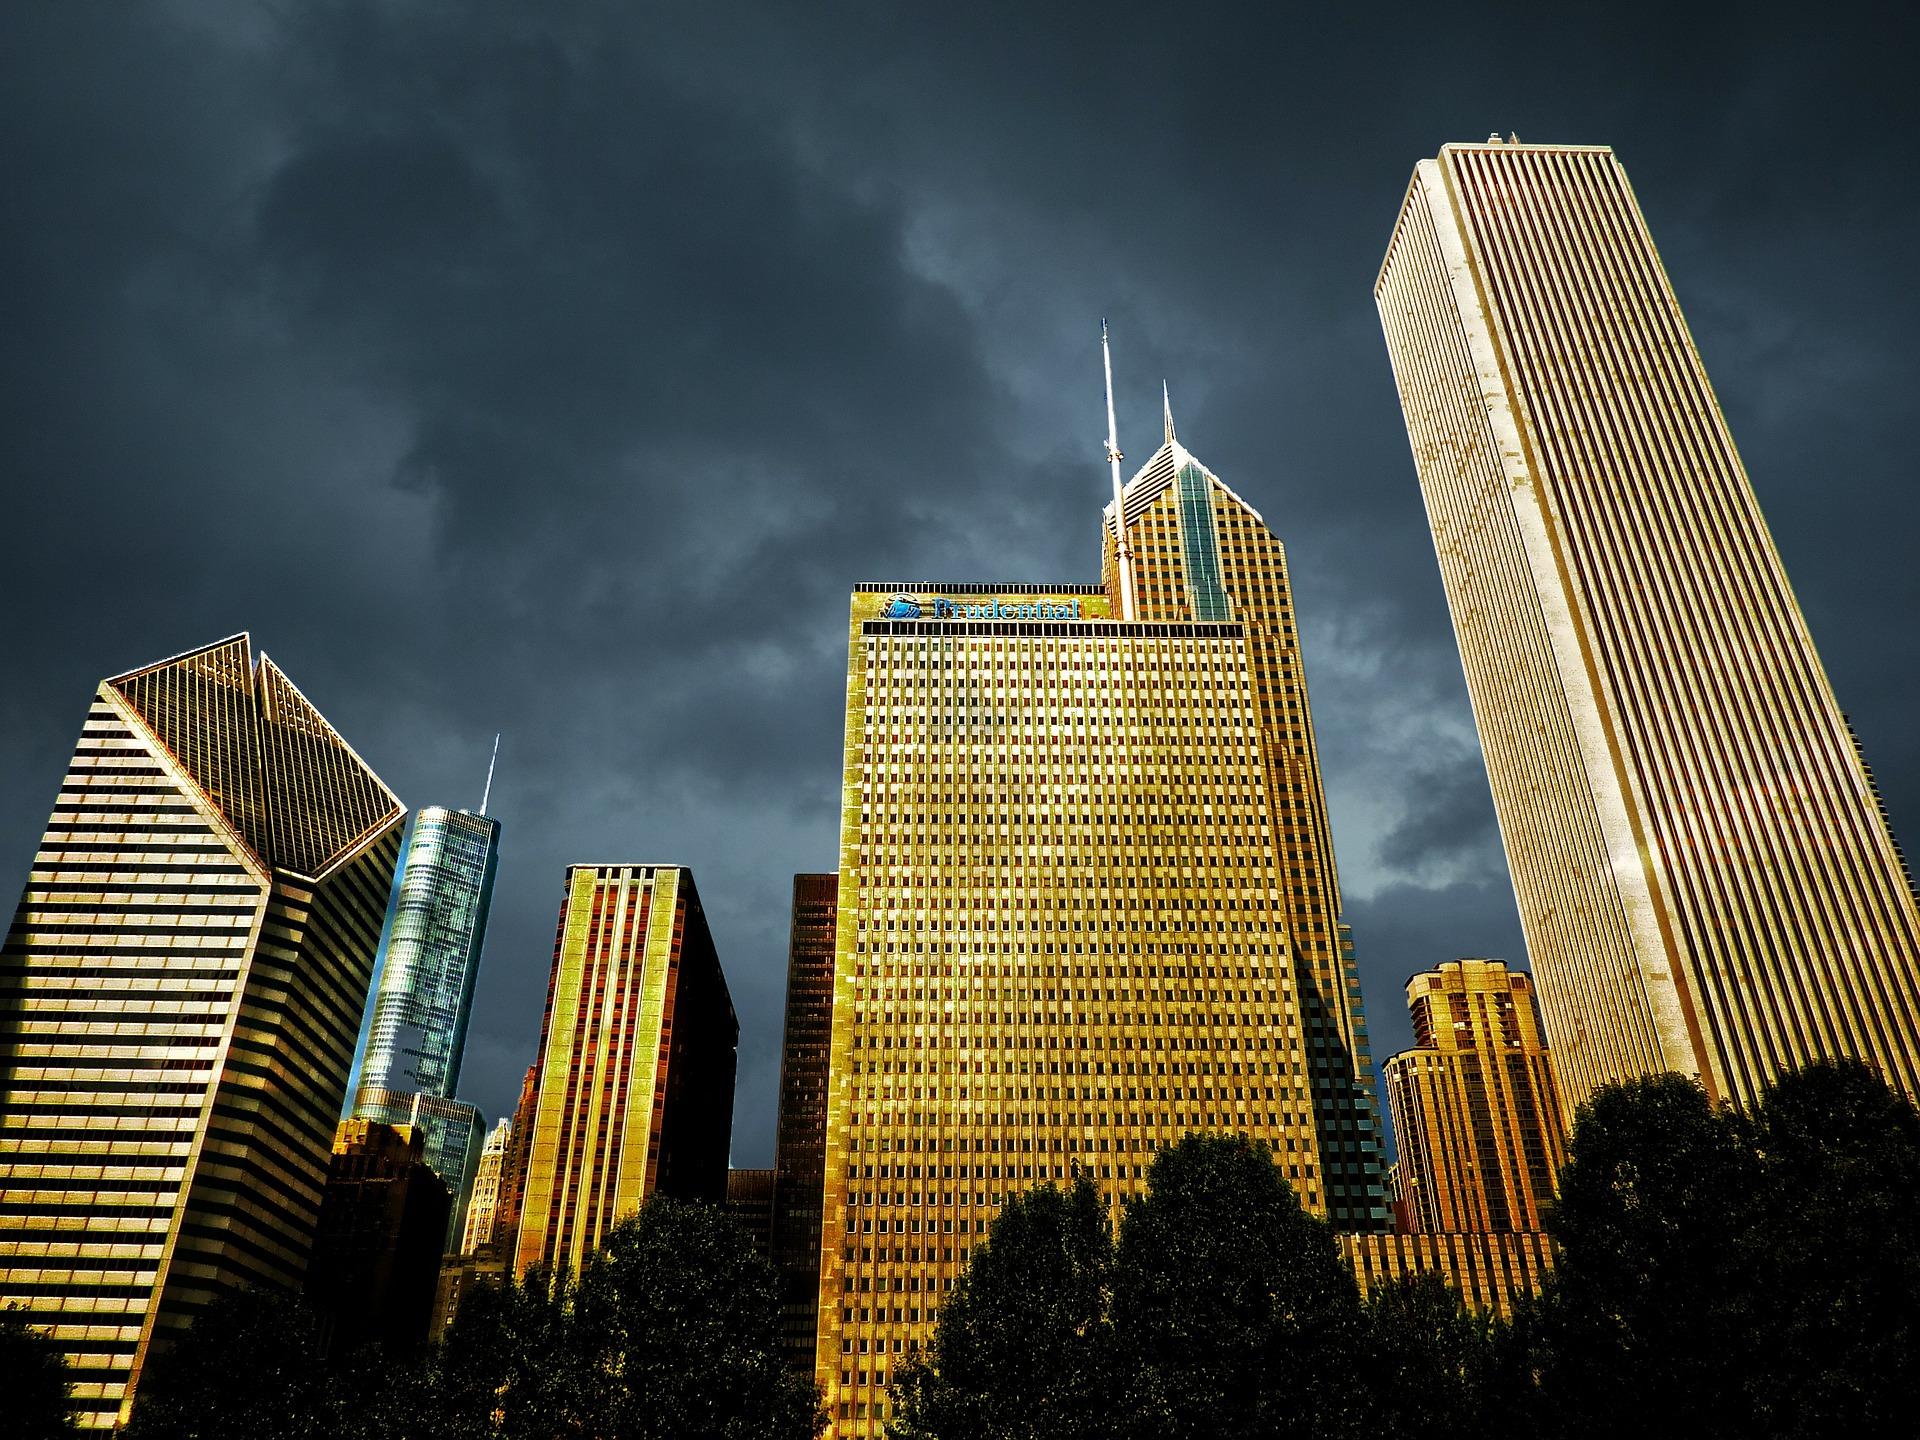 chicago-200496_1920